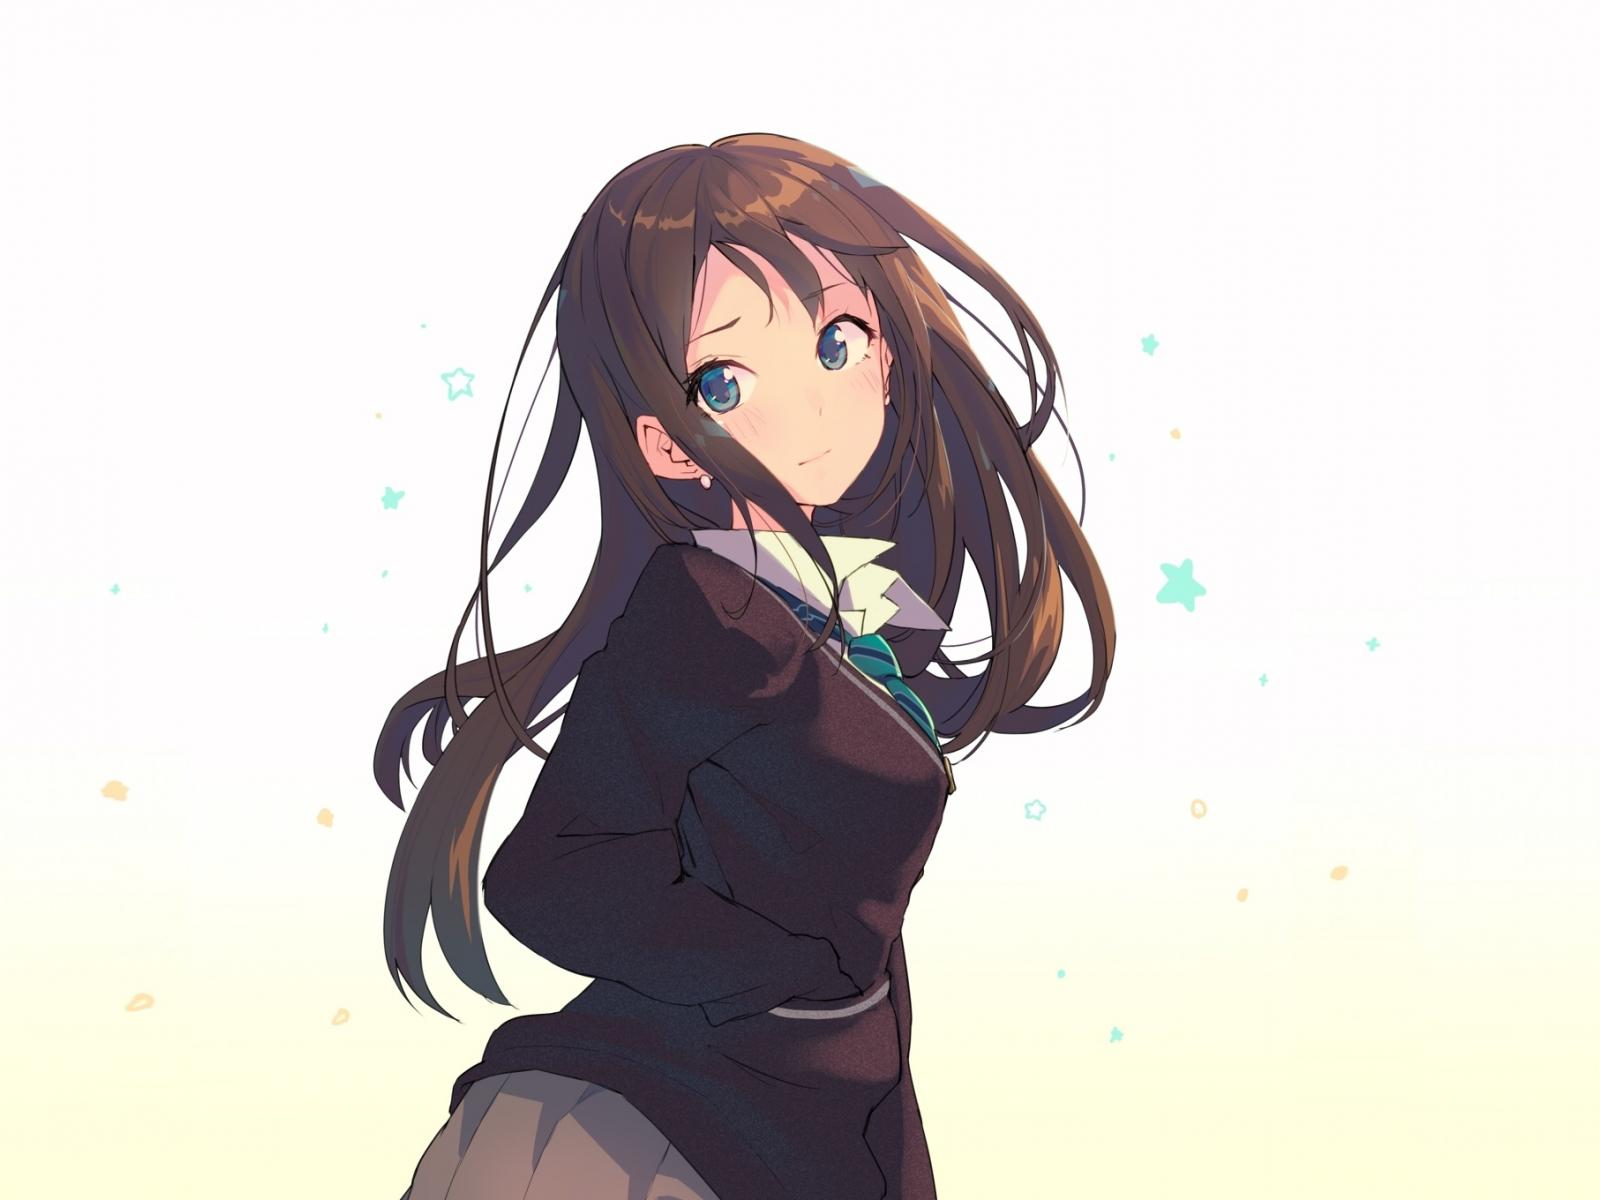 Download 1600x1200 Wallpaper Anime Cute School Girl Long Hair